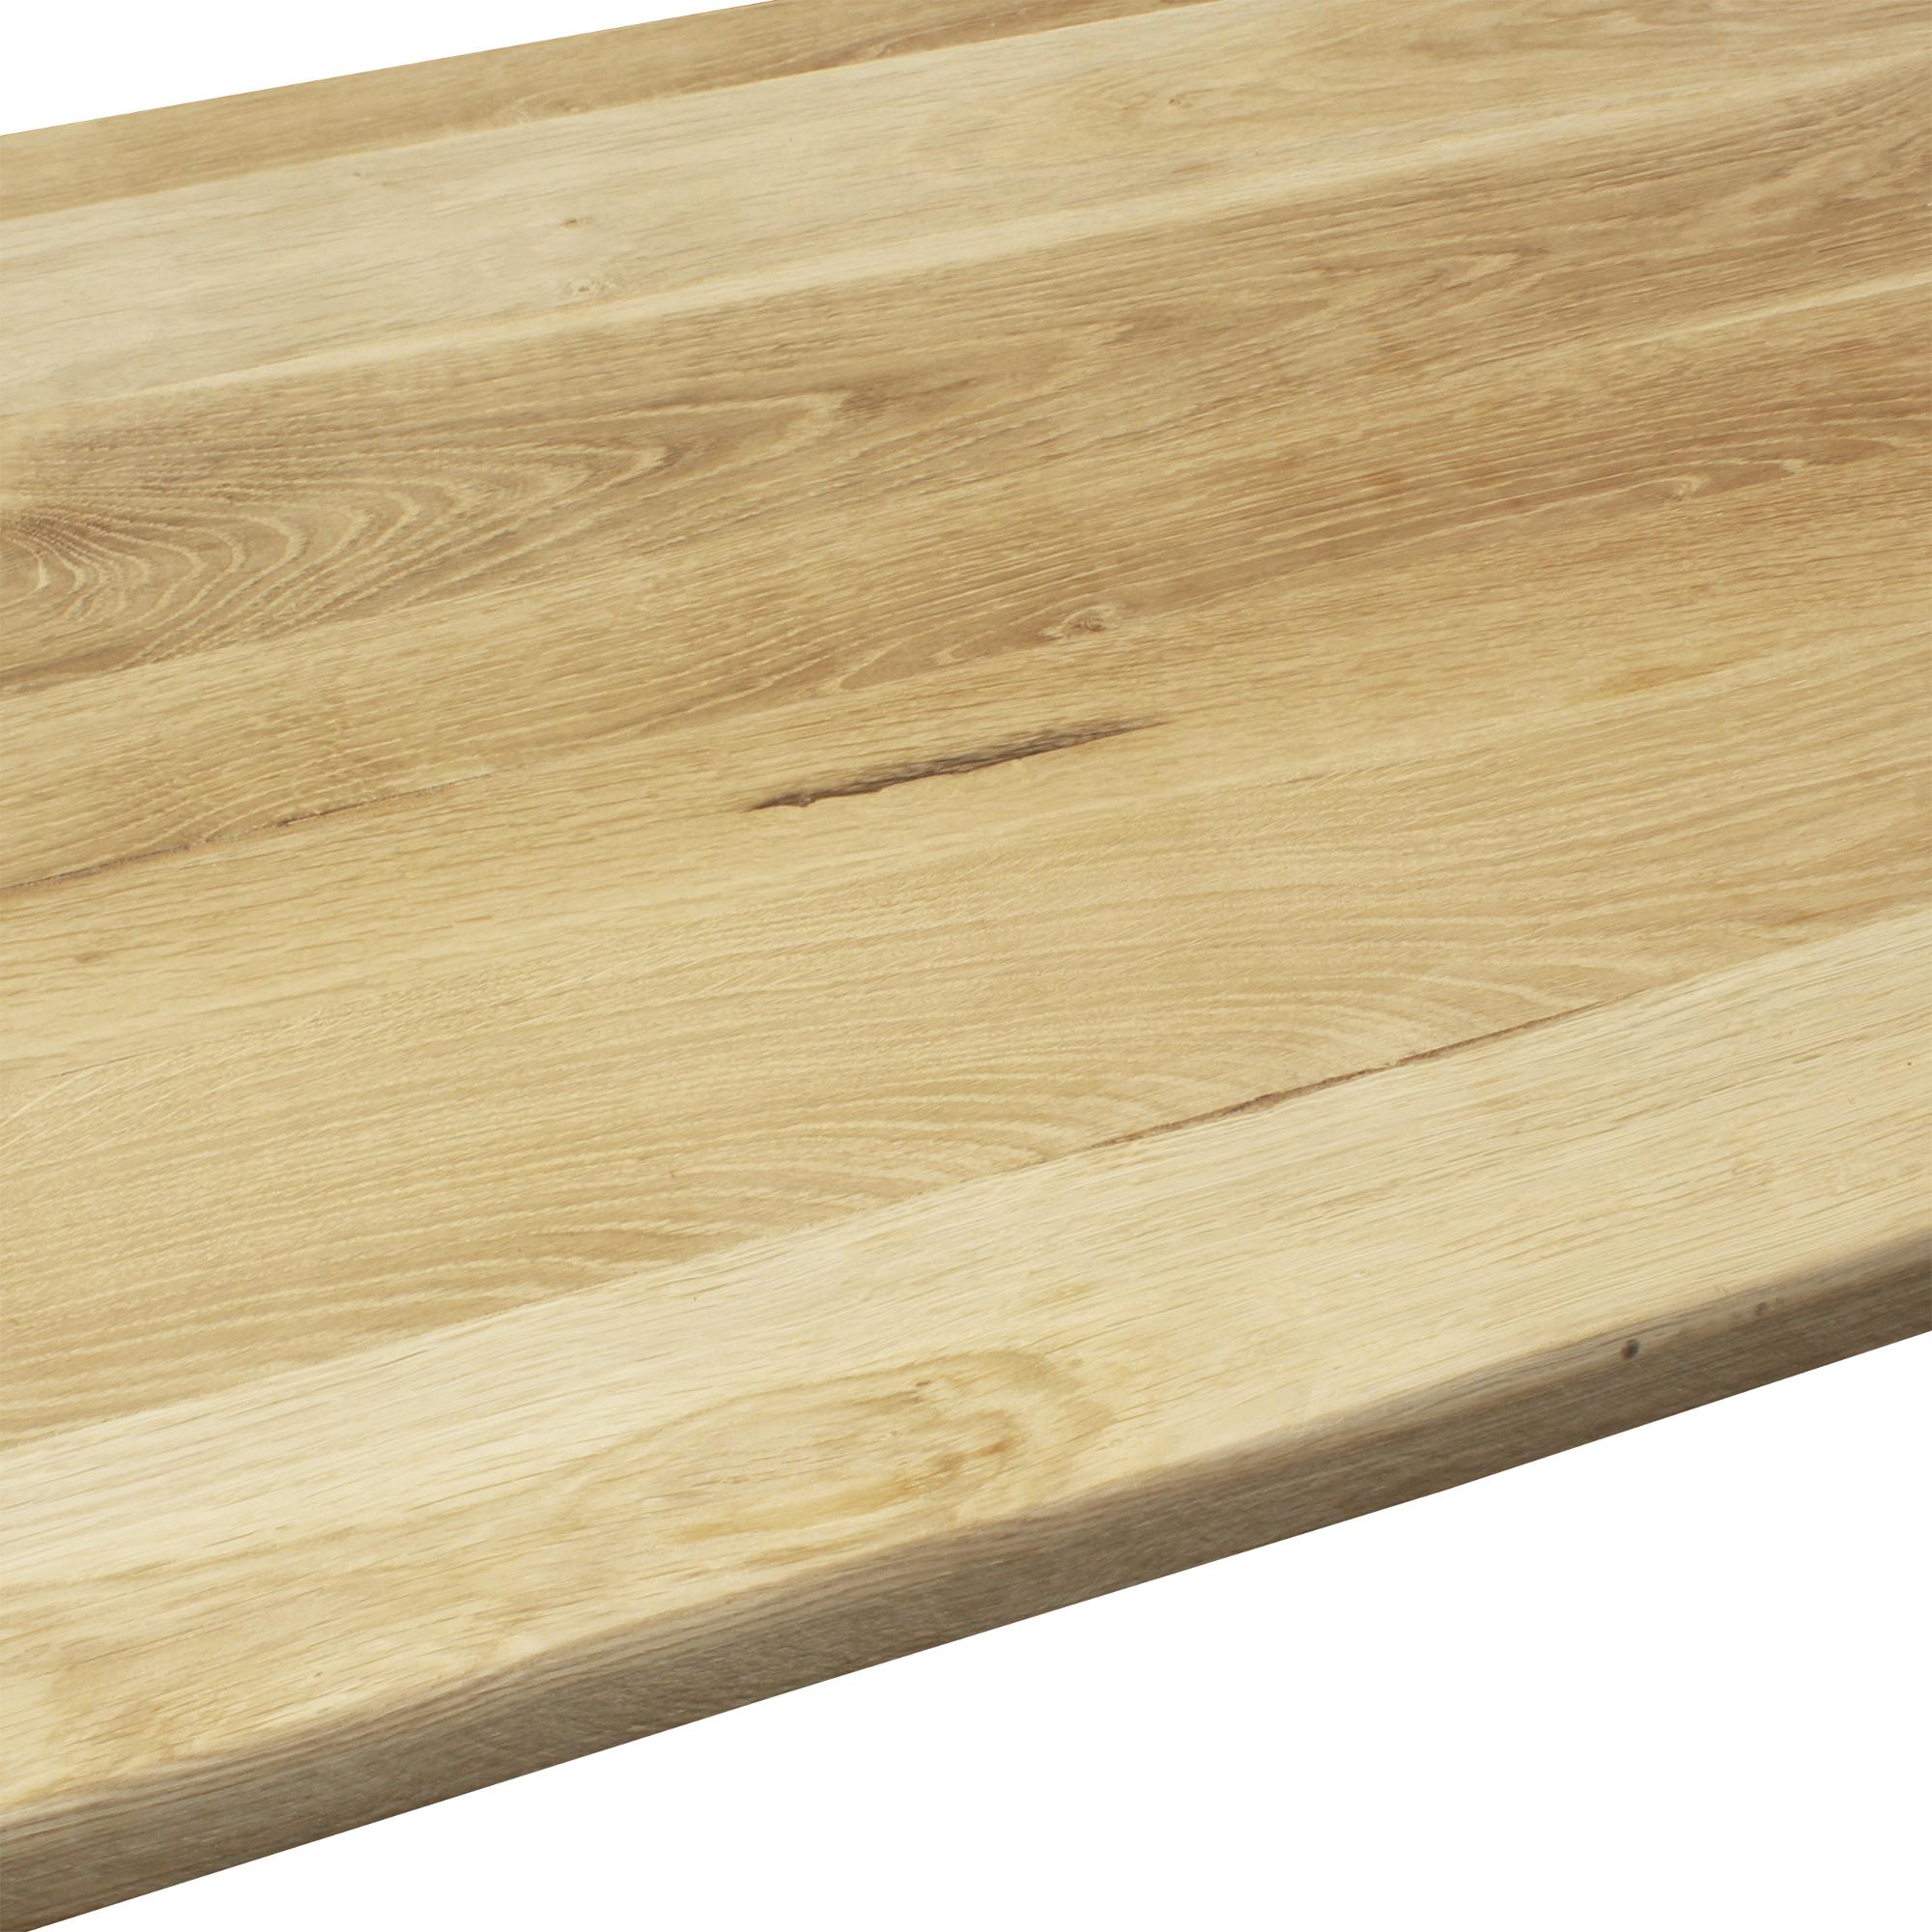 tischplatte eichenholz massivholzplatte eiche massiv holz diy 140x80cm ebay. Black Bedroom Furniture Sets. Home Design Ideas